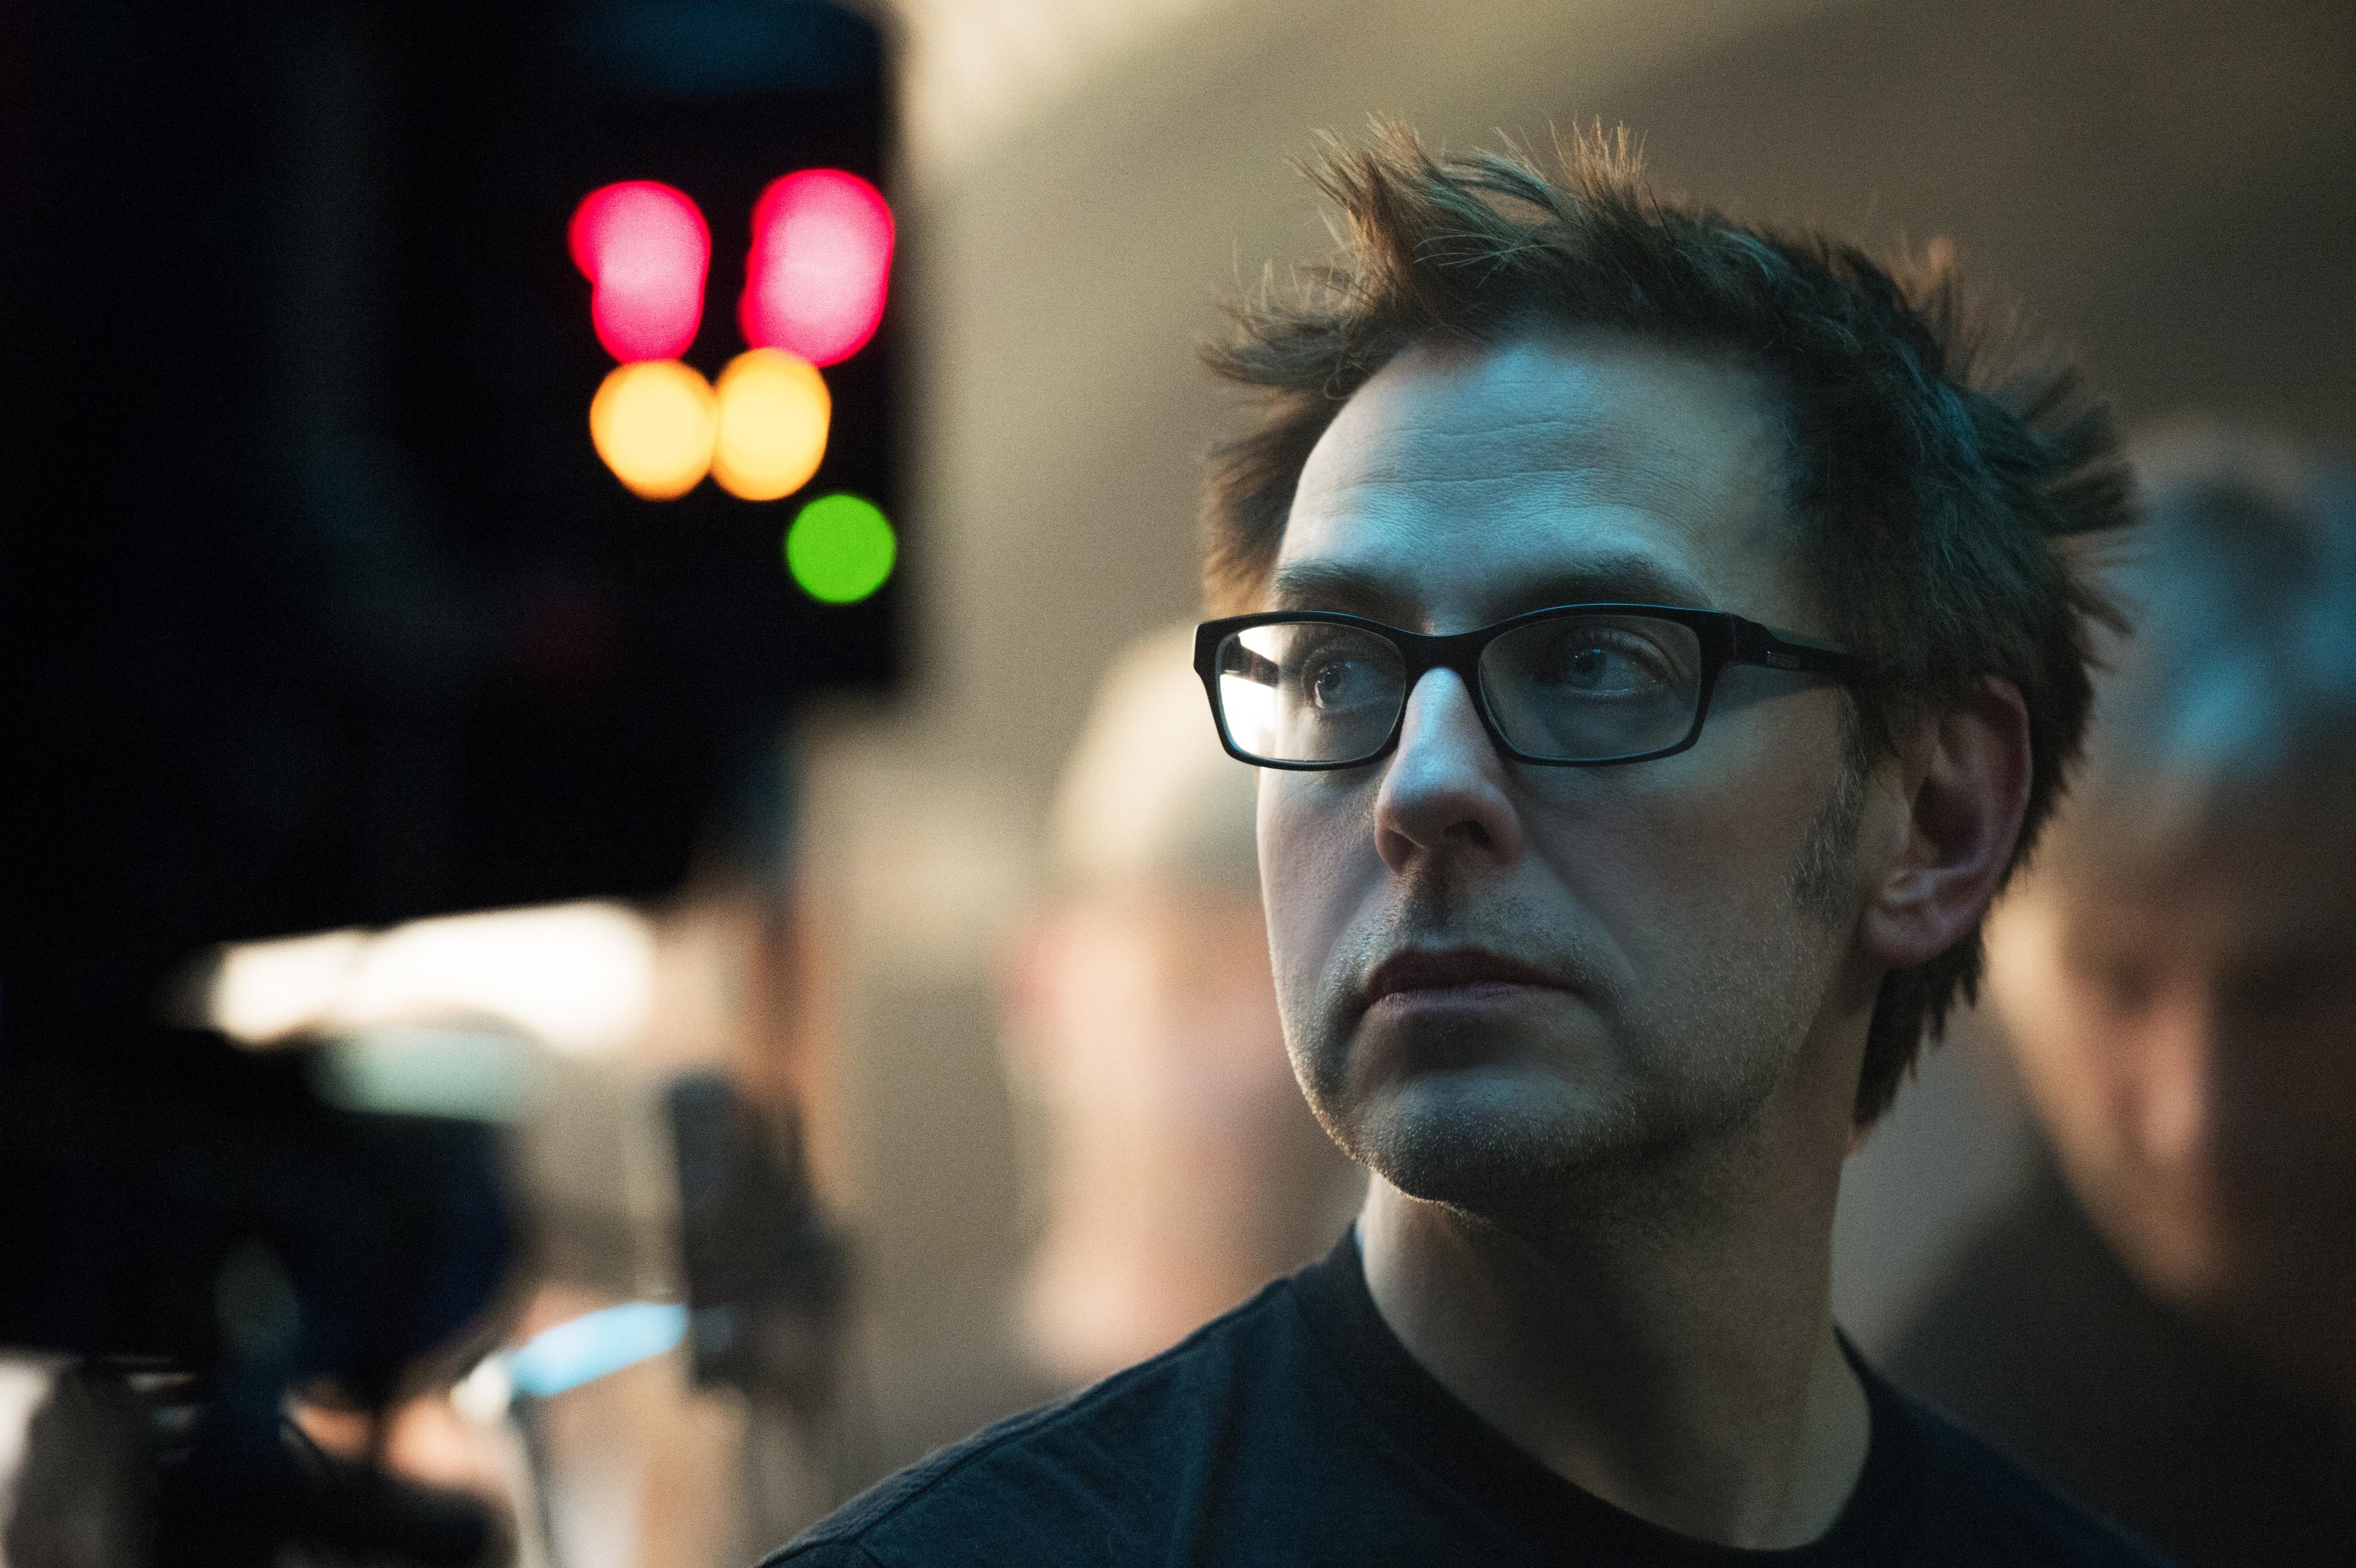 Director de Guardians of the Galaxy explica el éxito de Deadpool